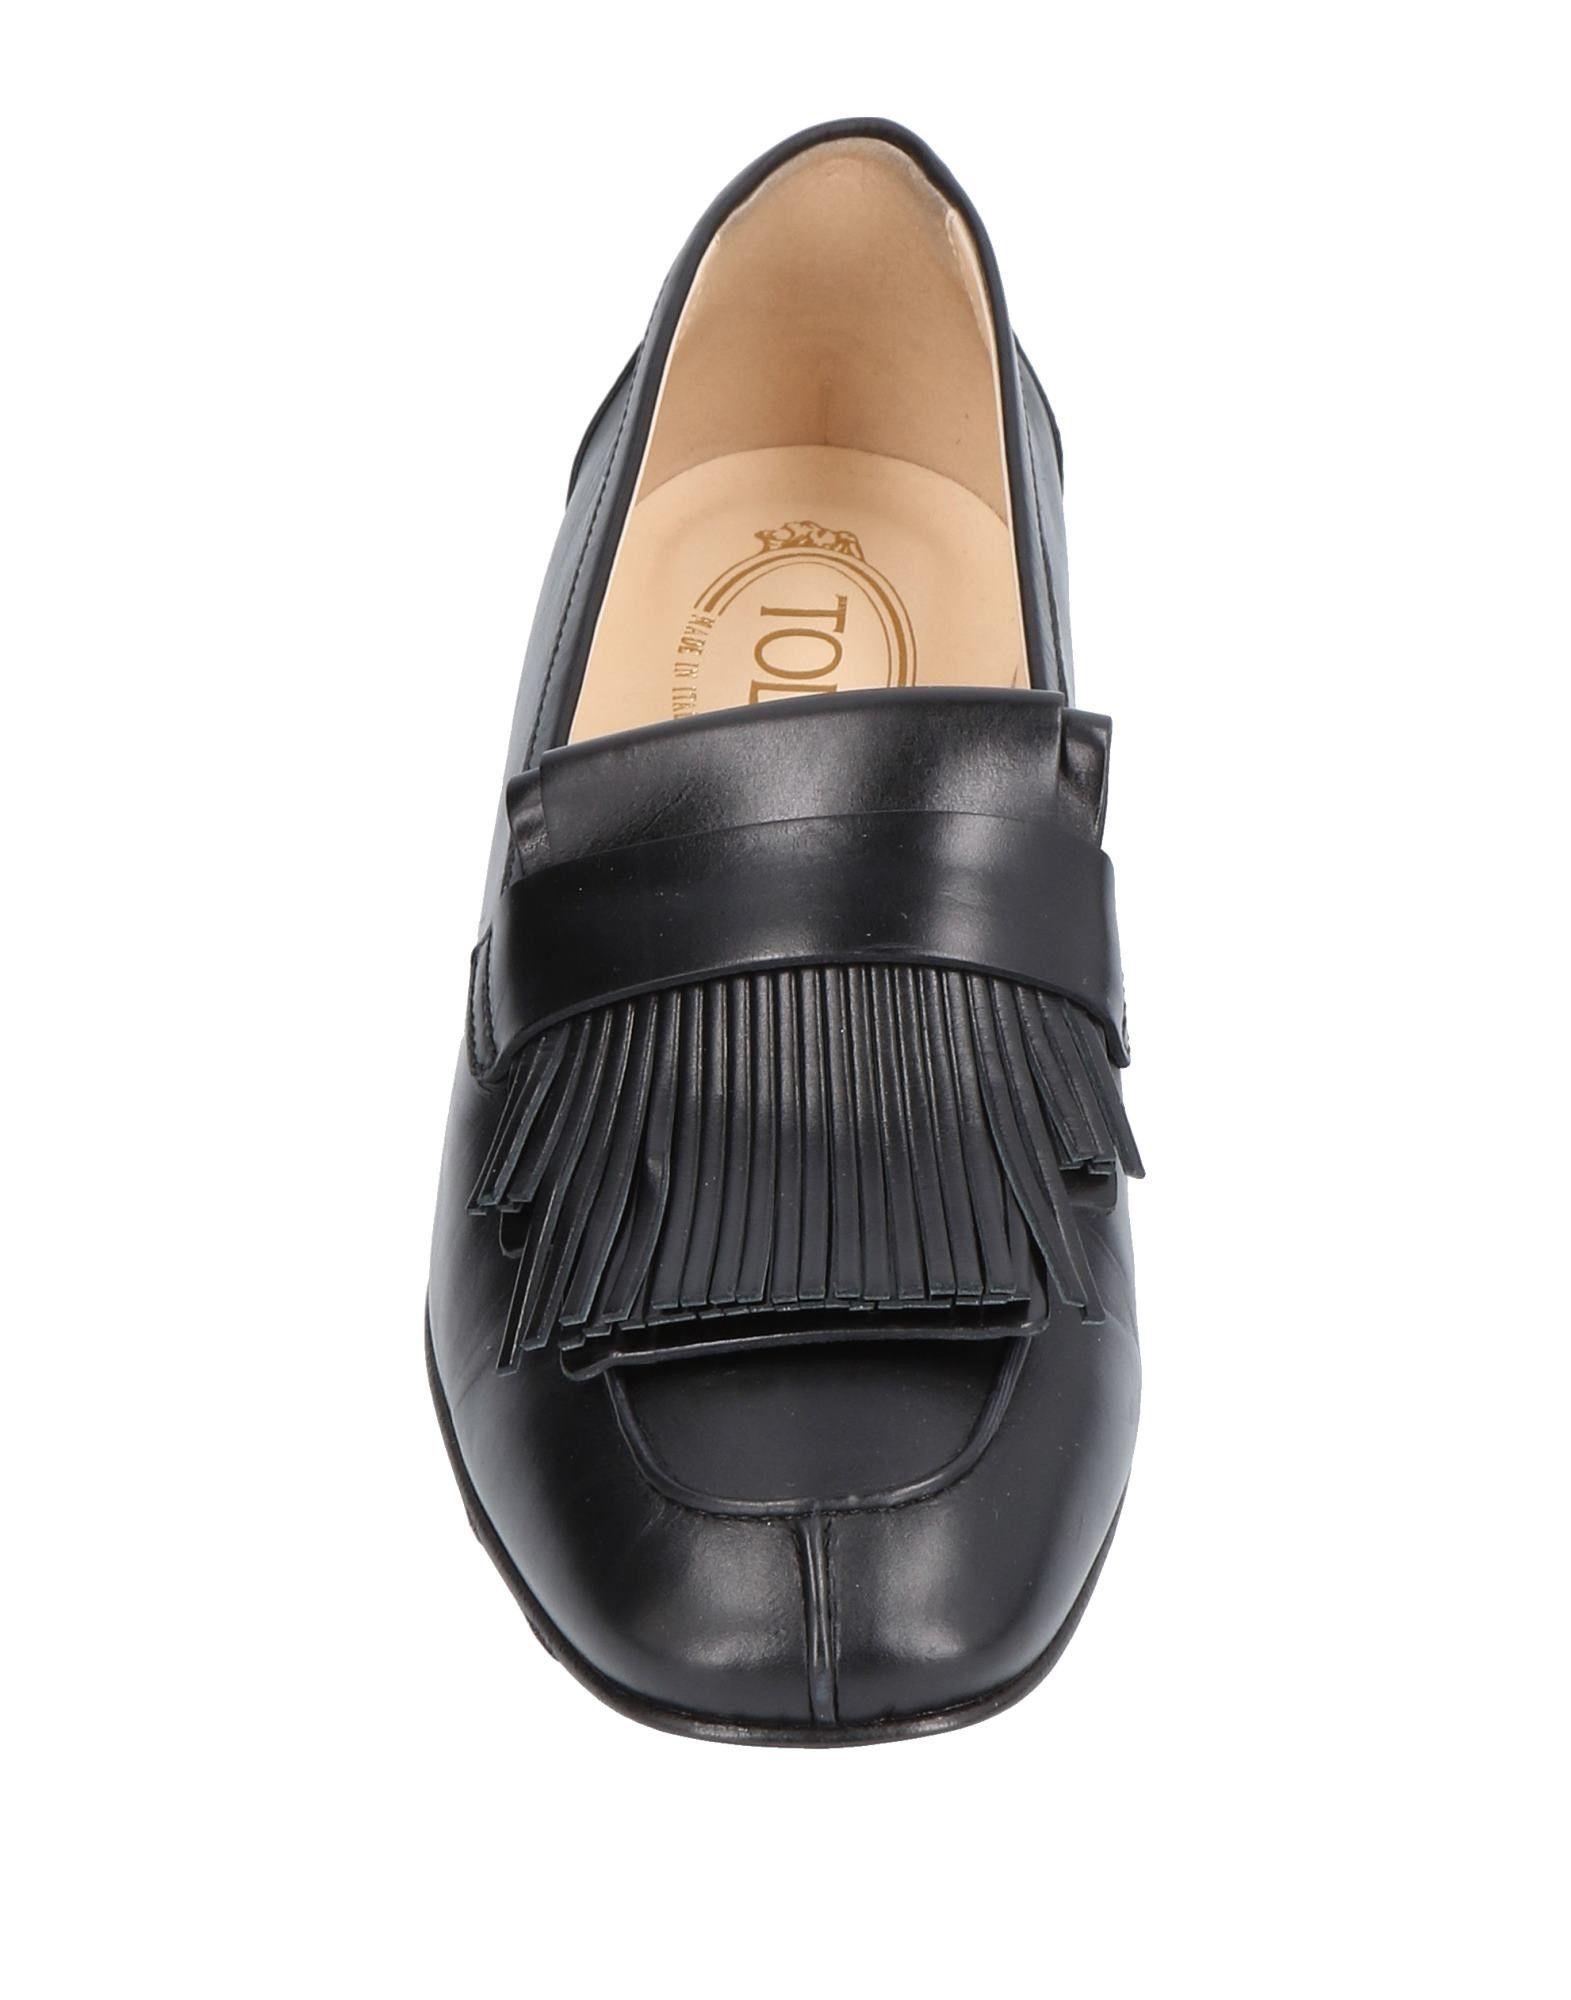 Tod's Damen Mokassins Damen Tod's  11475953IN Heiße Schuhe 5aff6b